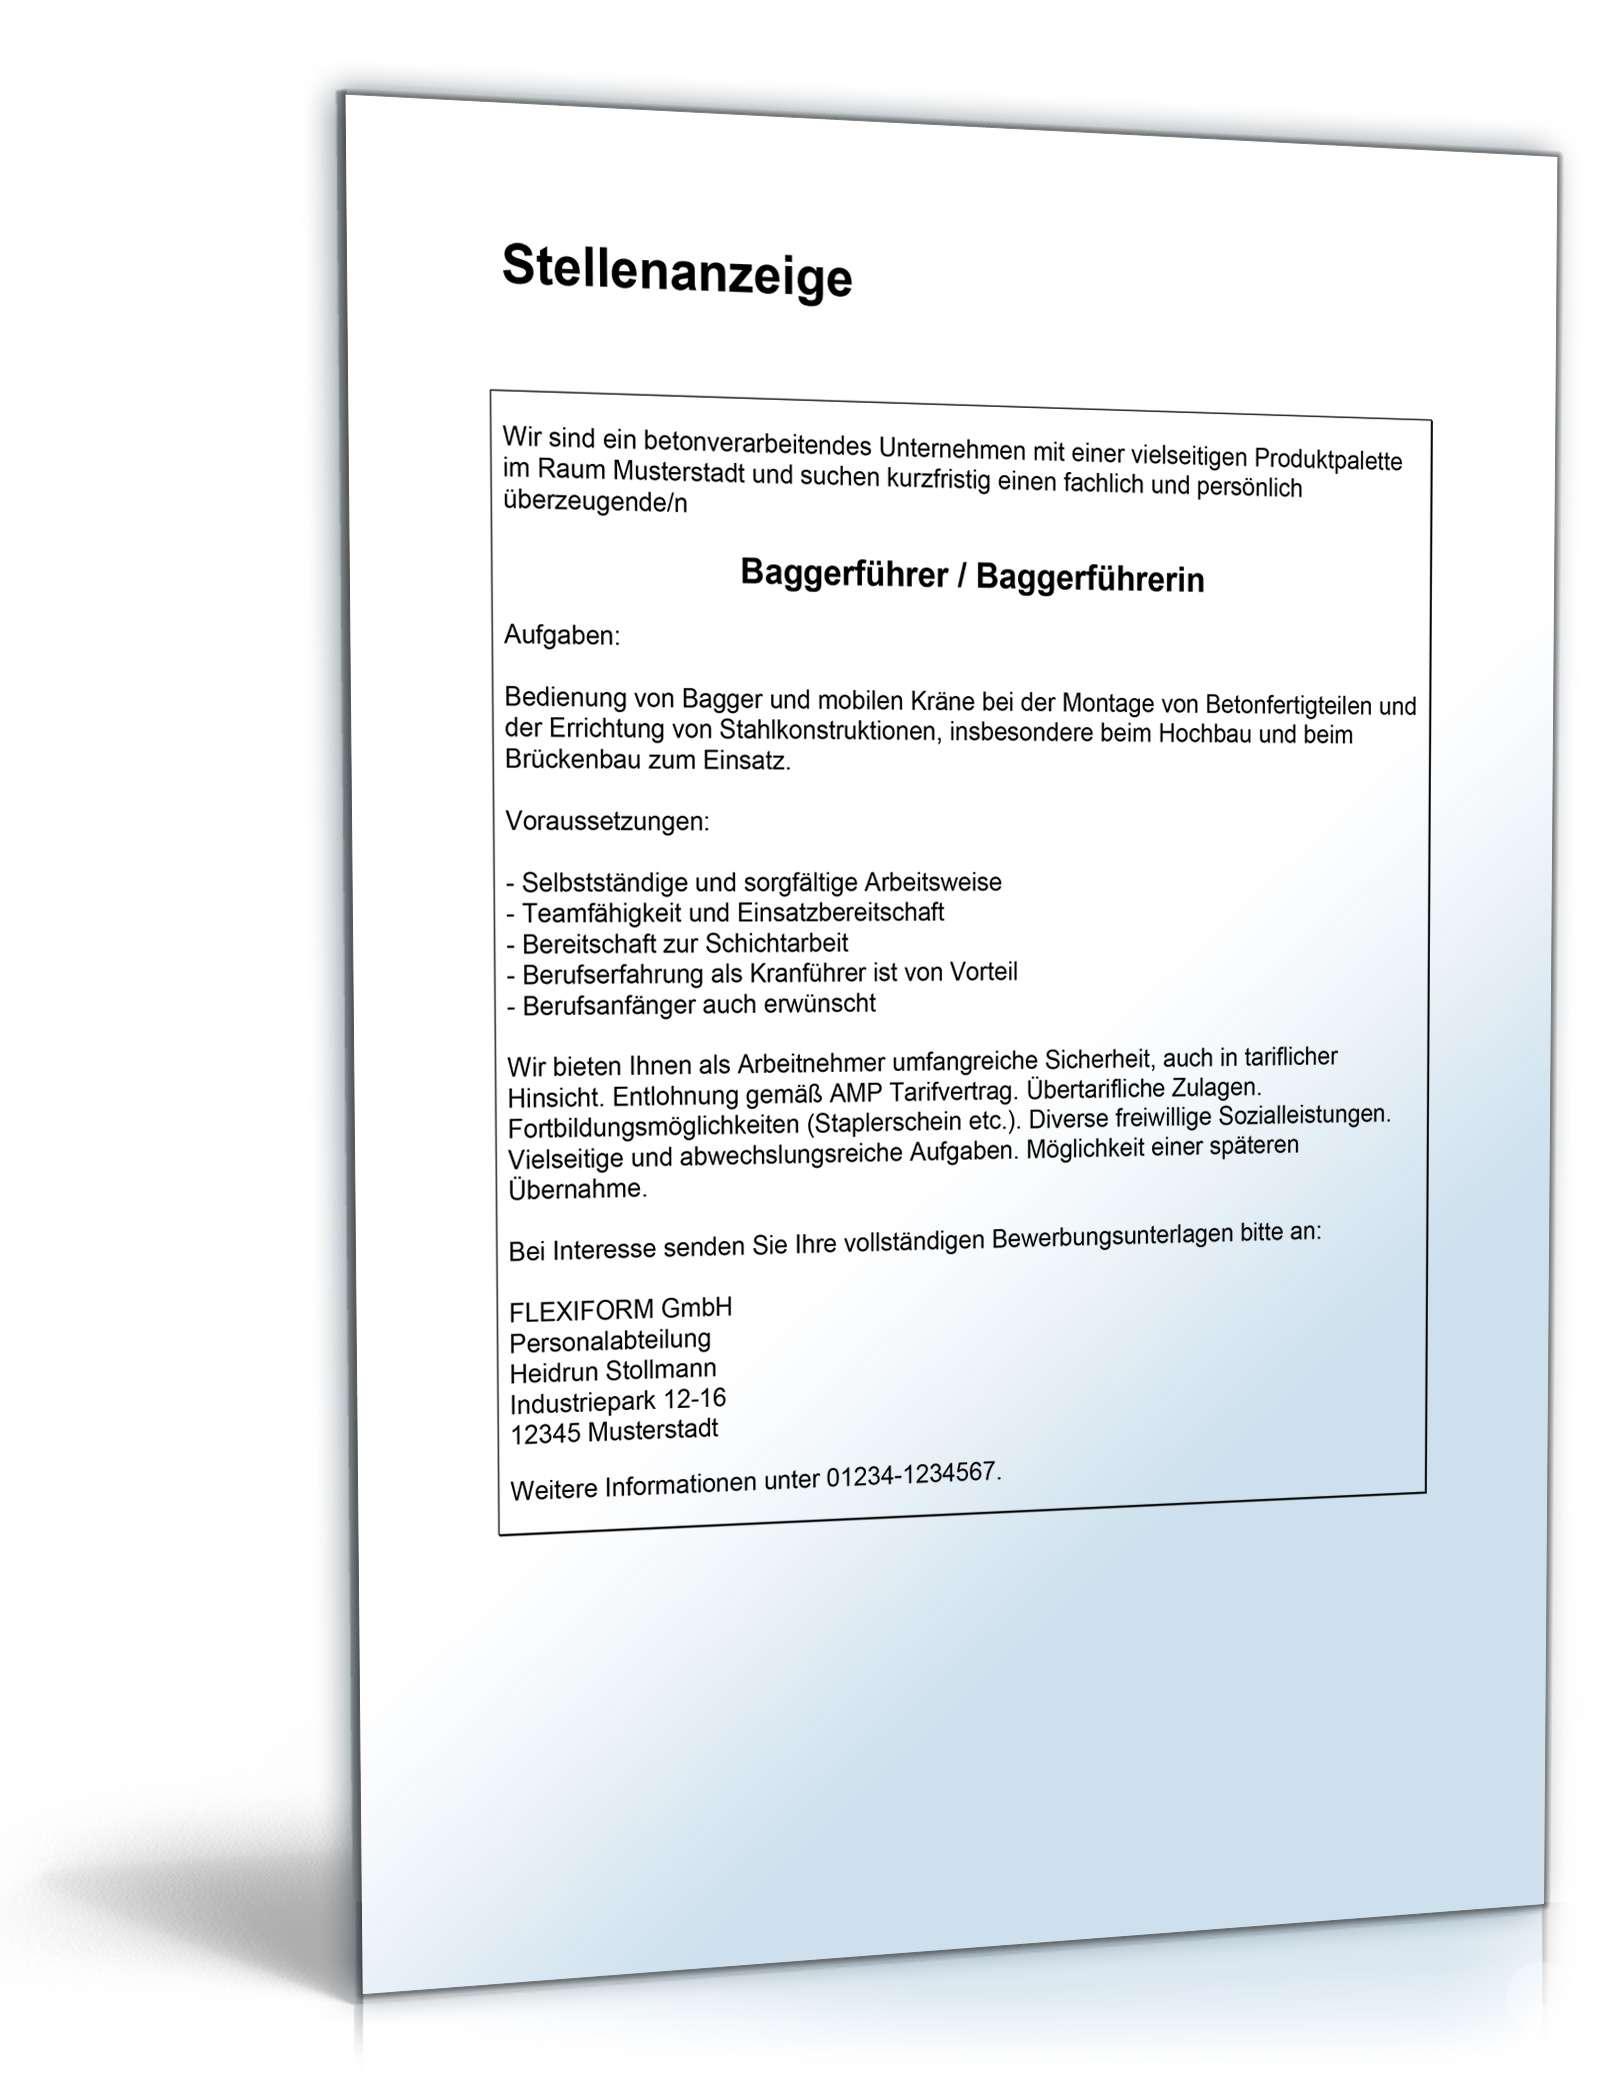 Bewerbungs-Paket Baggerführer   Muster zum Download